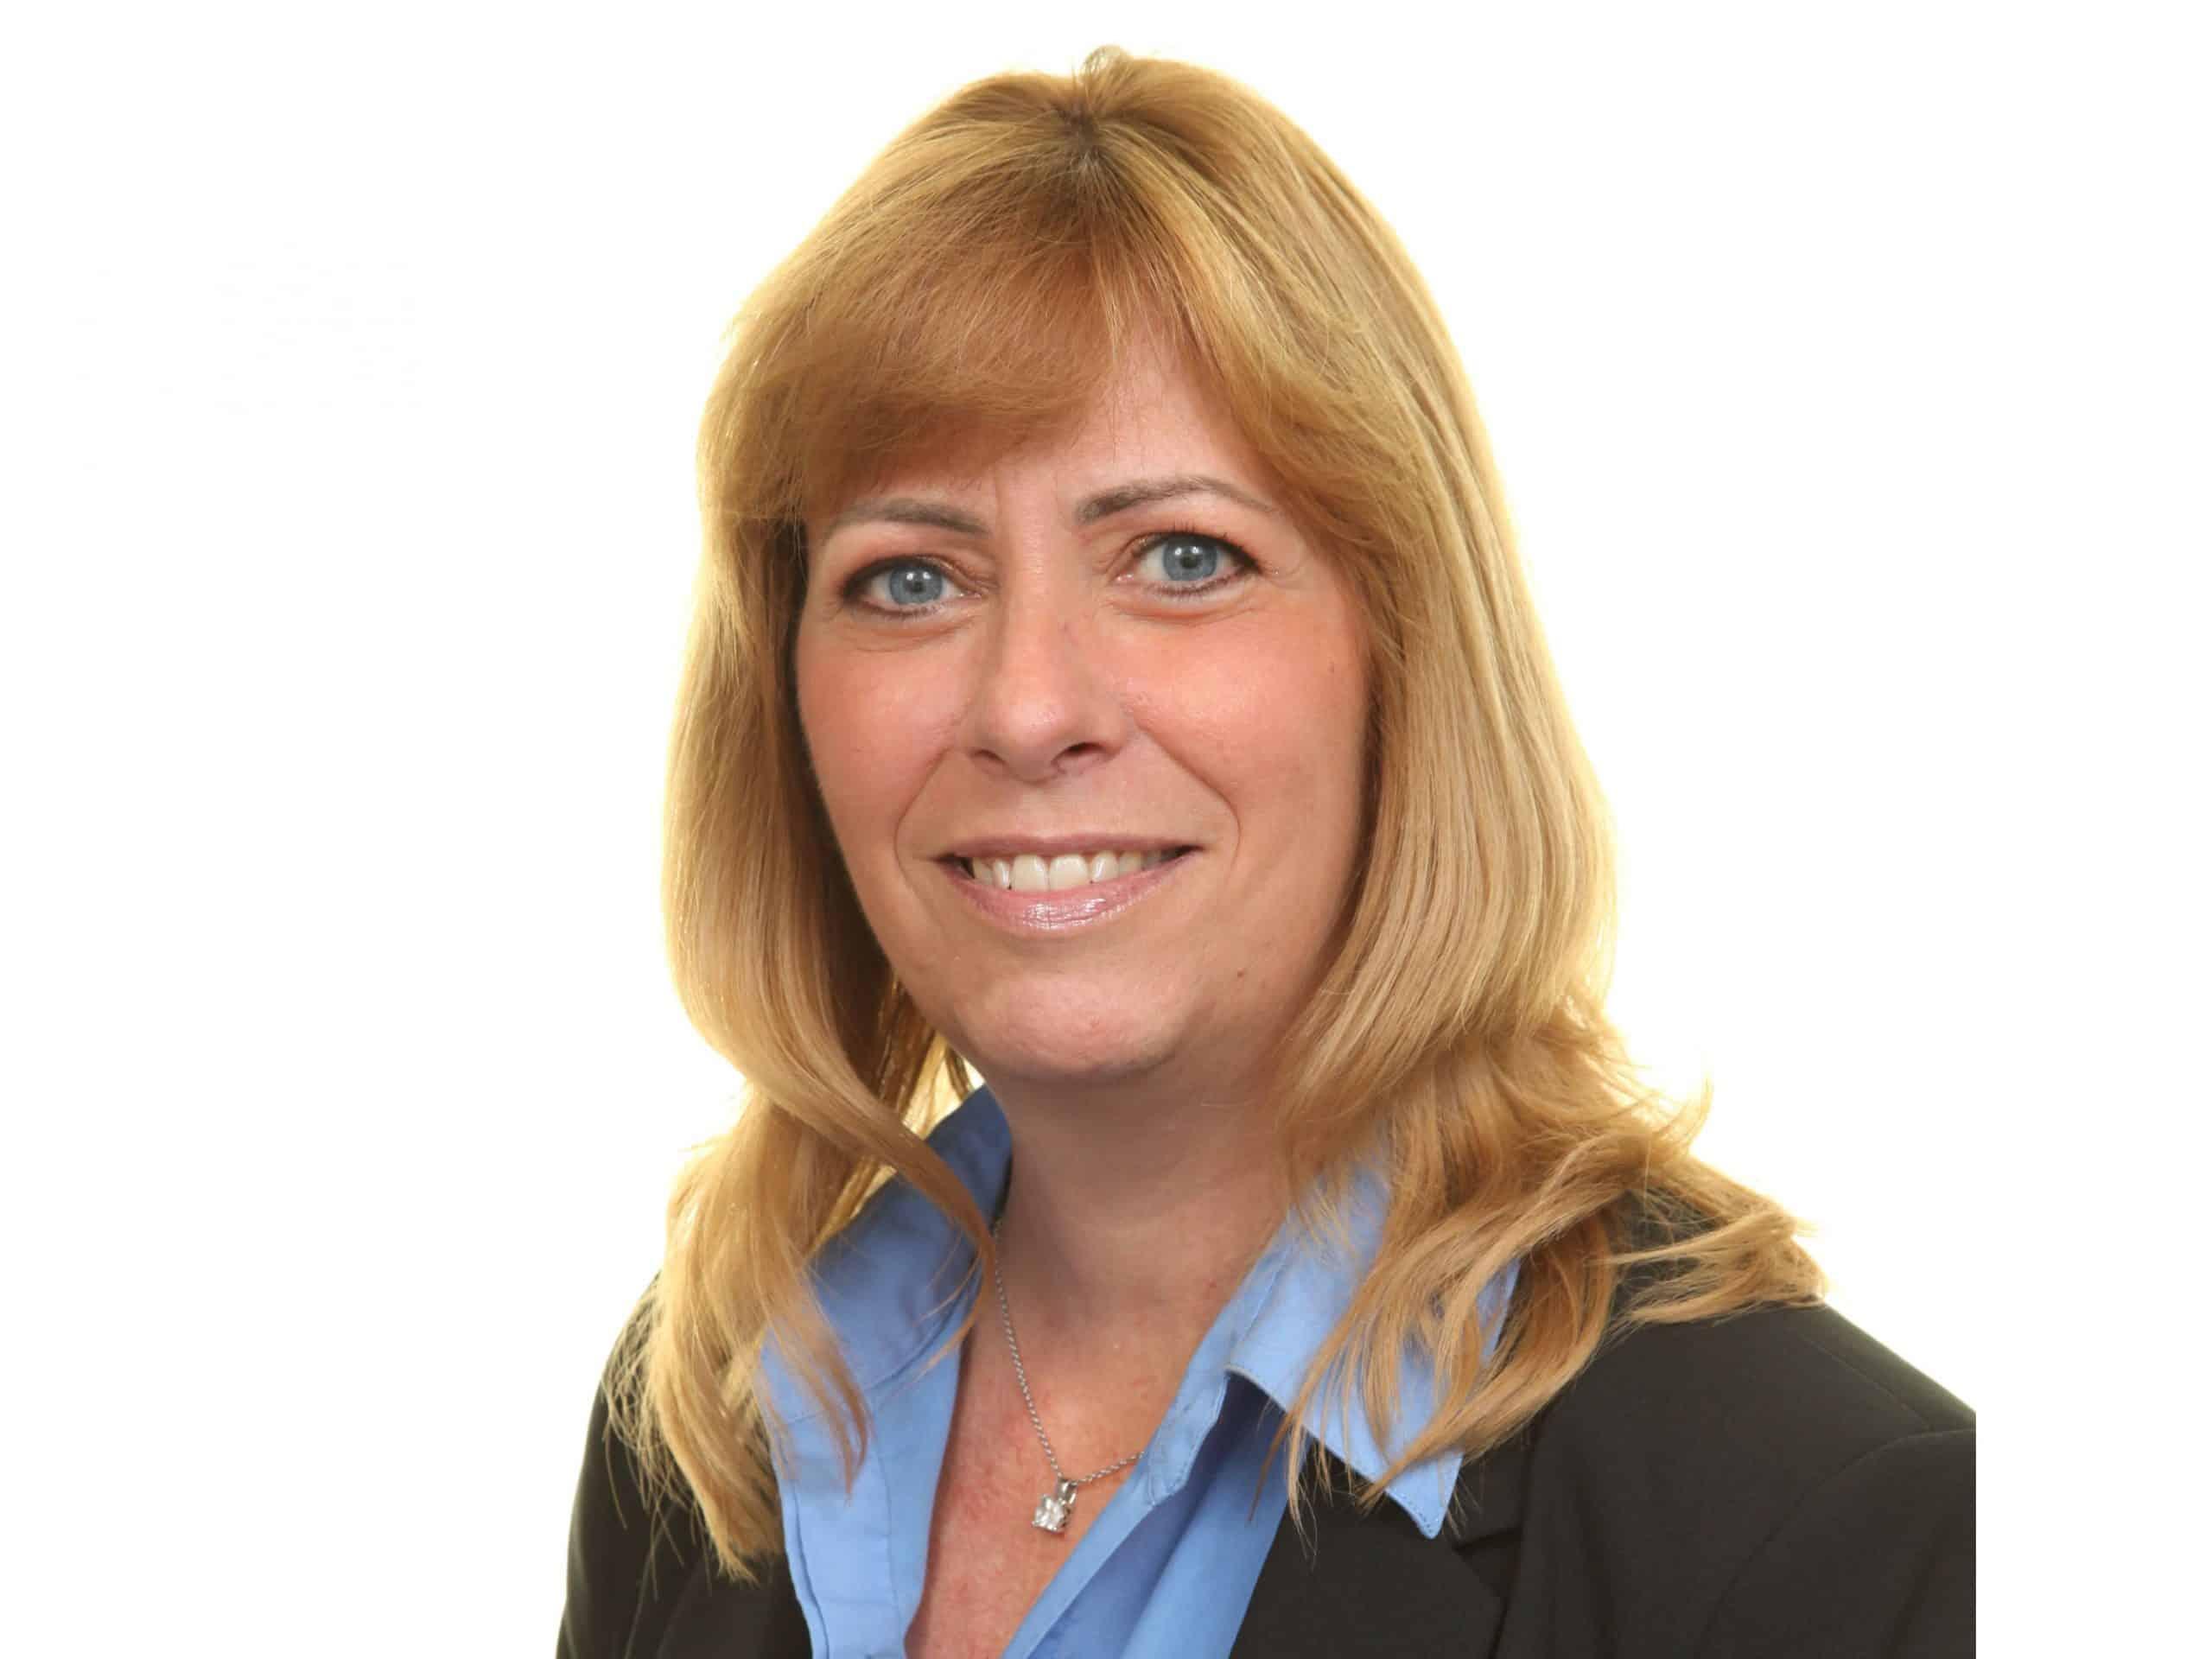 Karen Russell, Managing Director of Clarity & Success UK